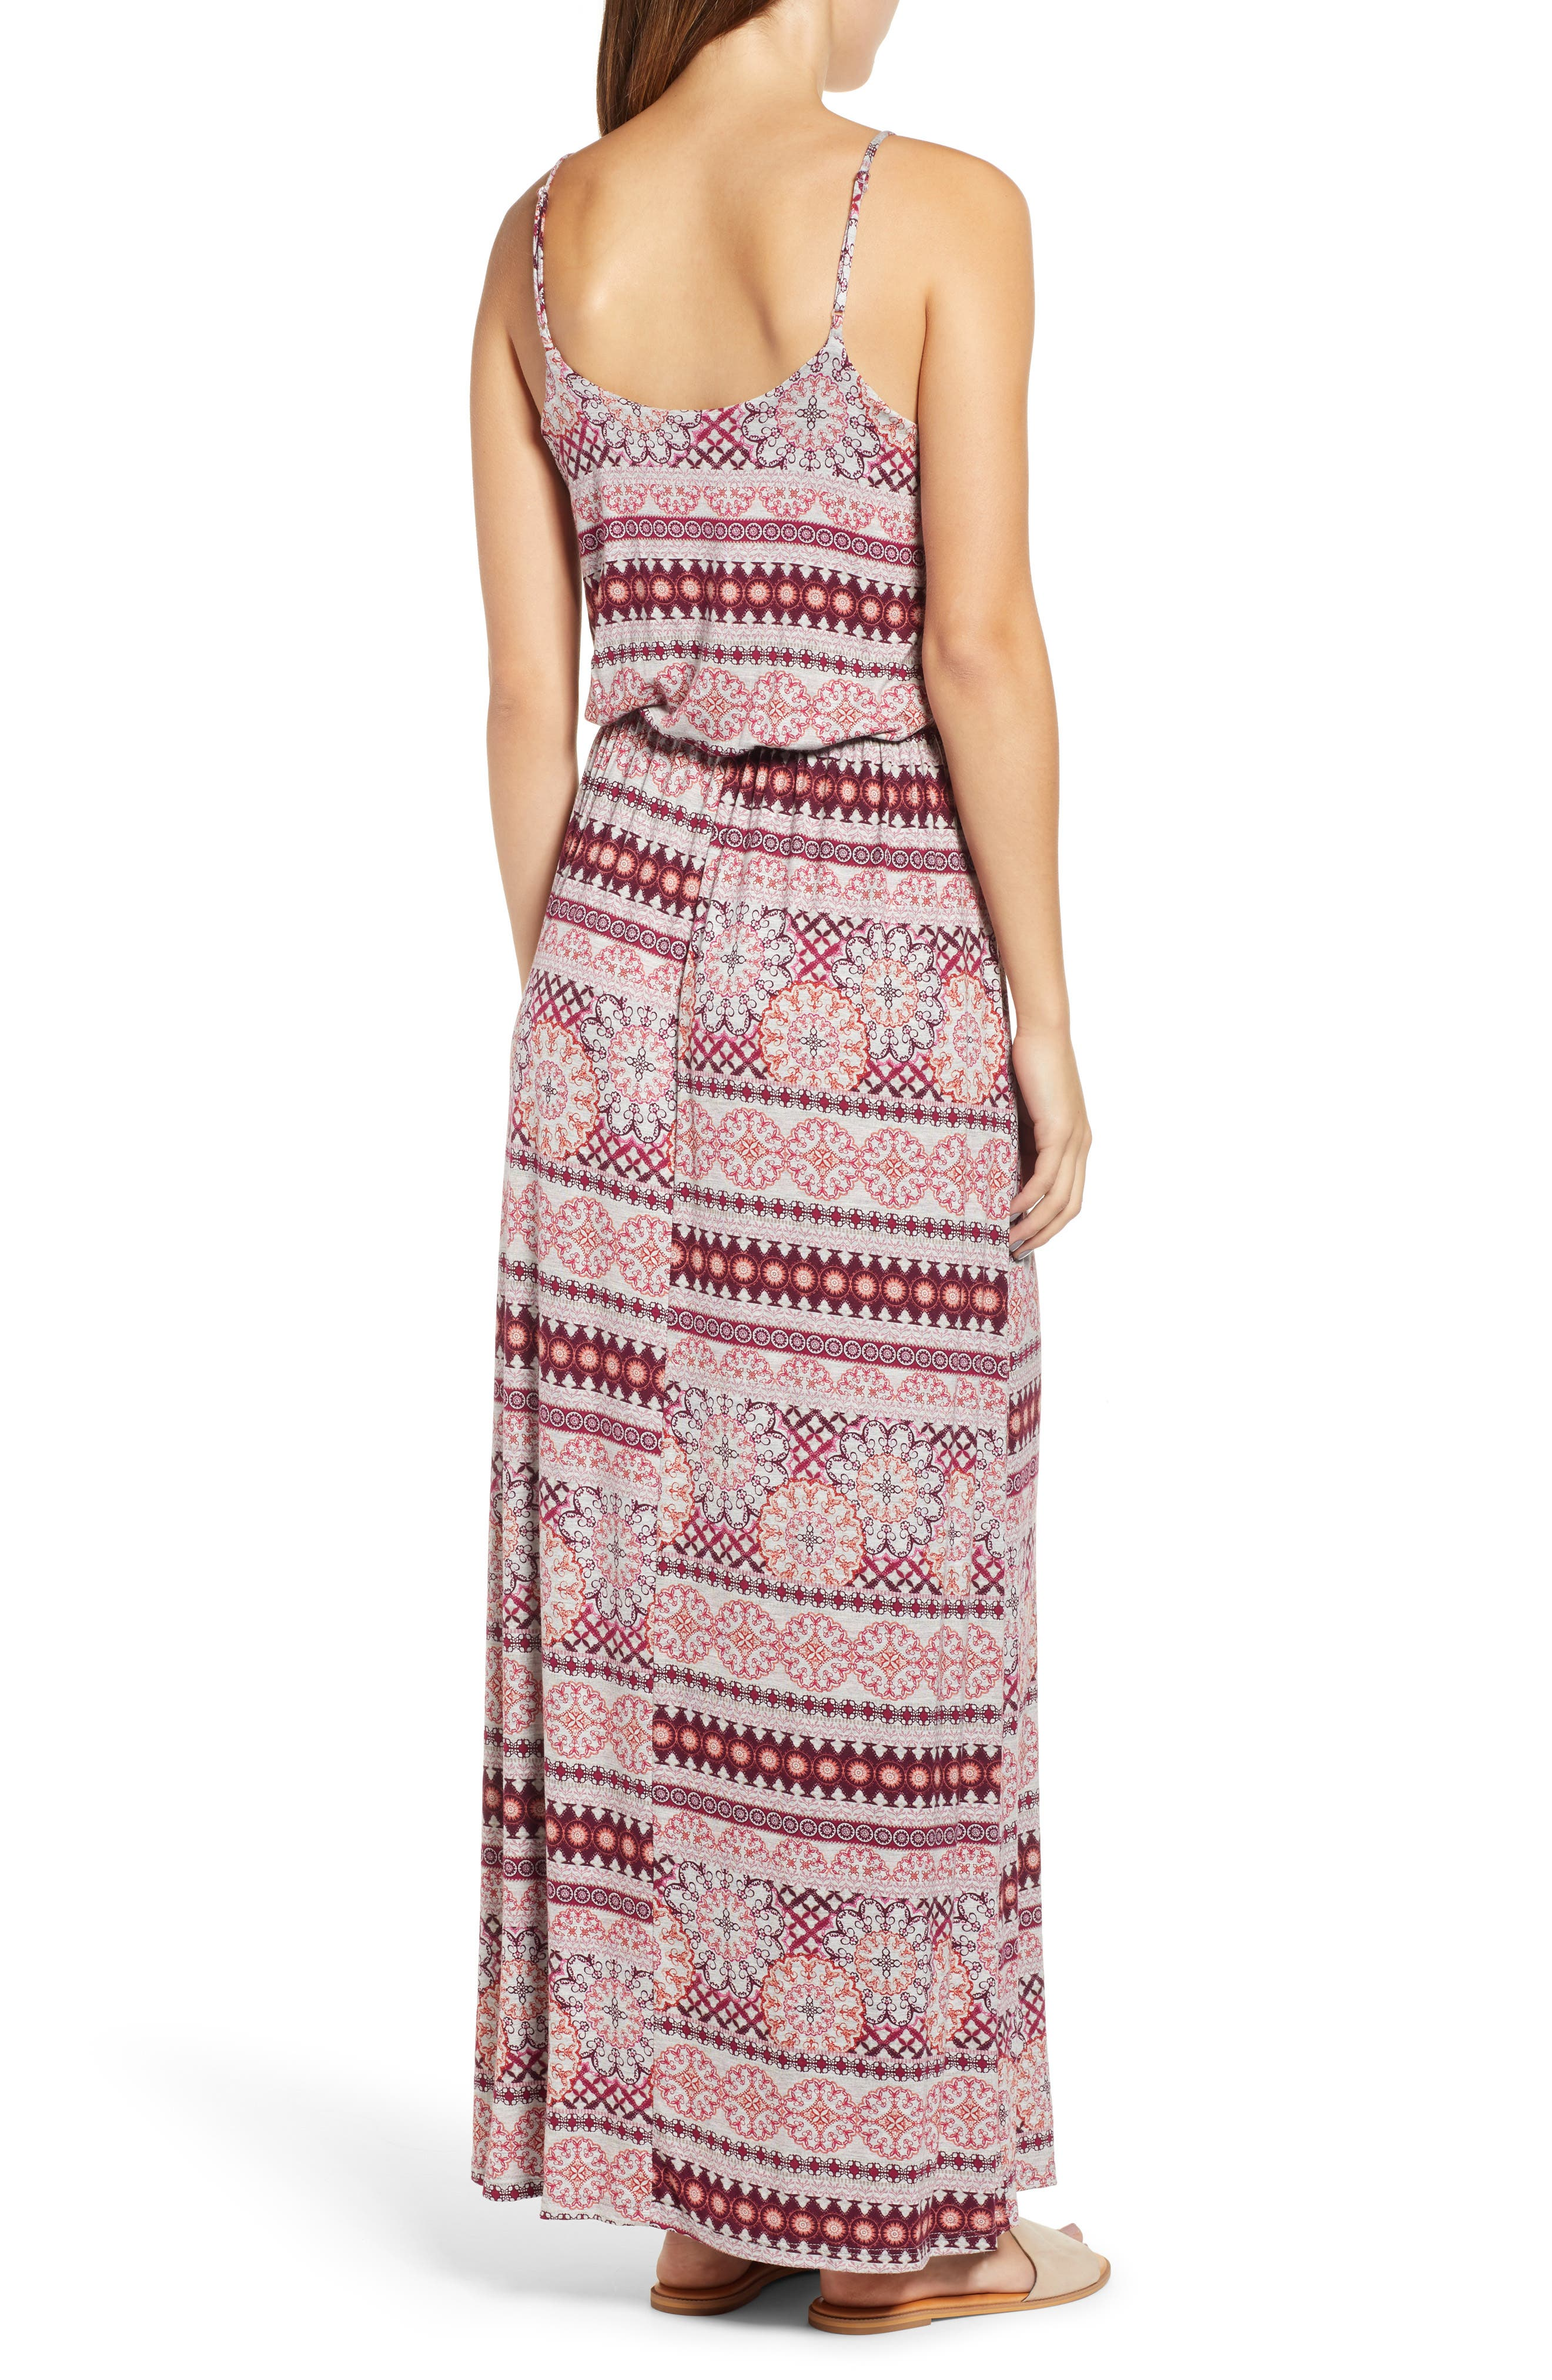 Knit Maxi Dress,                             Alternate thumbnail 2, color,                             HEATHERGREY/ CORAL